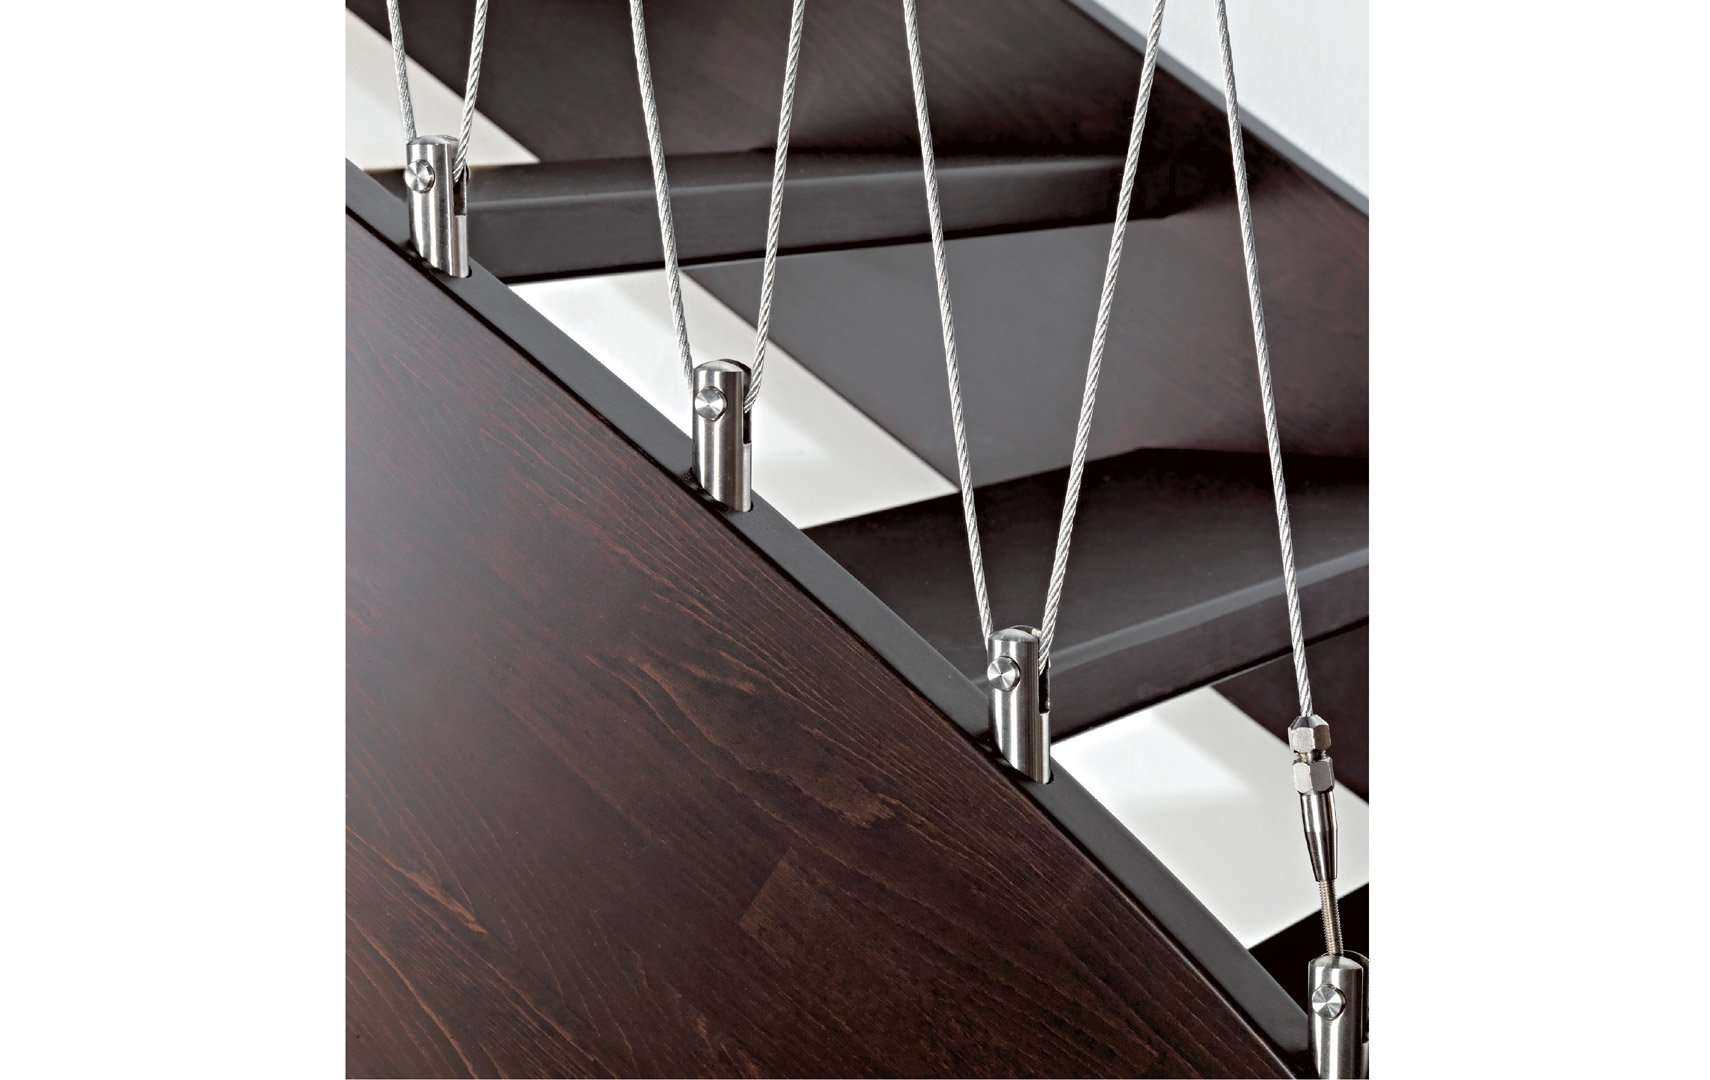 vertigo escalier rampe escalier monte escalier escalier quart tournant escalier bois. Black Bedroom Furniture Sets. Home Design Ideas